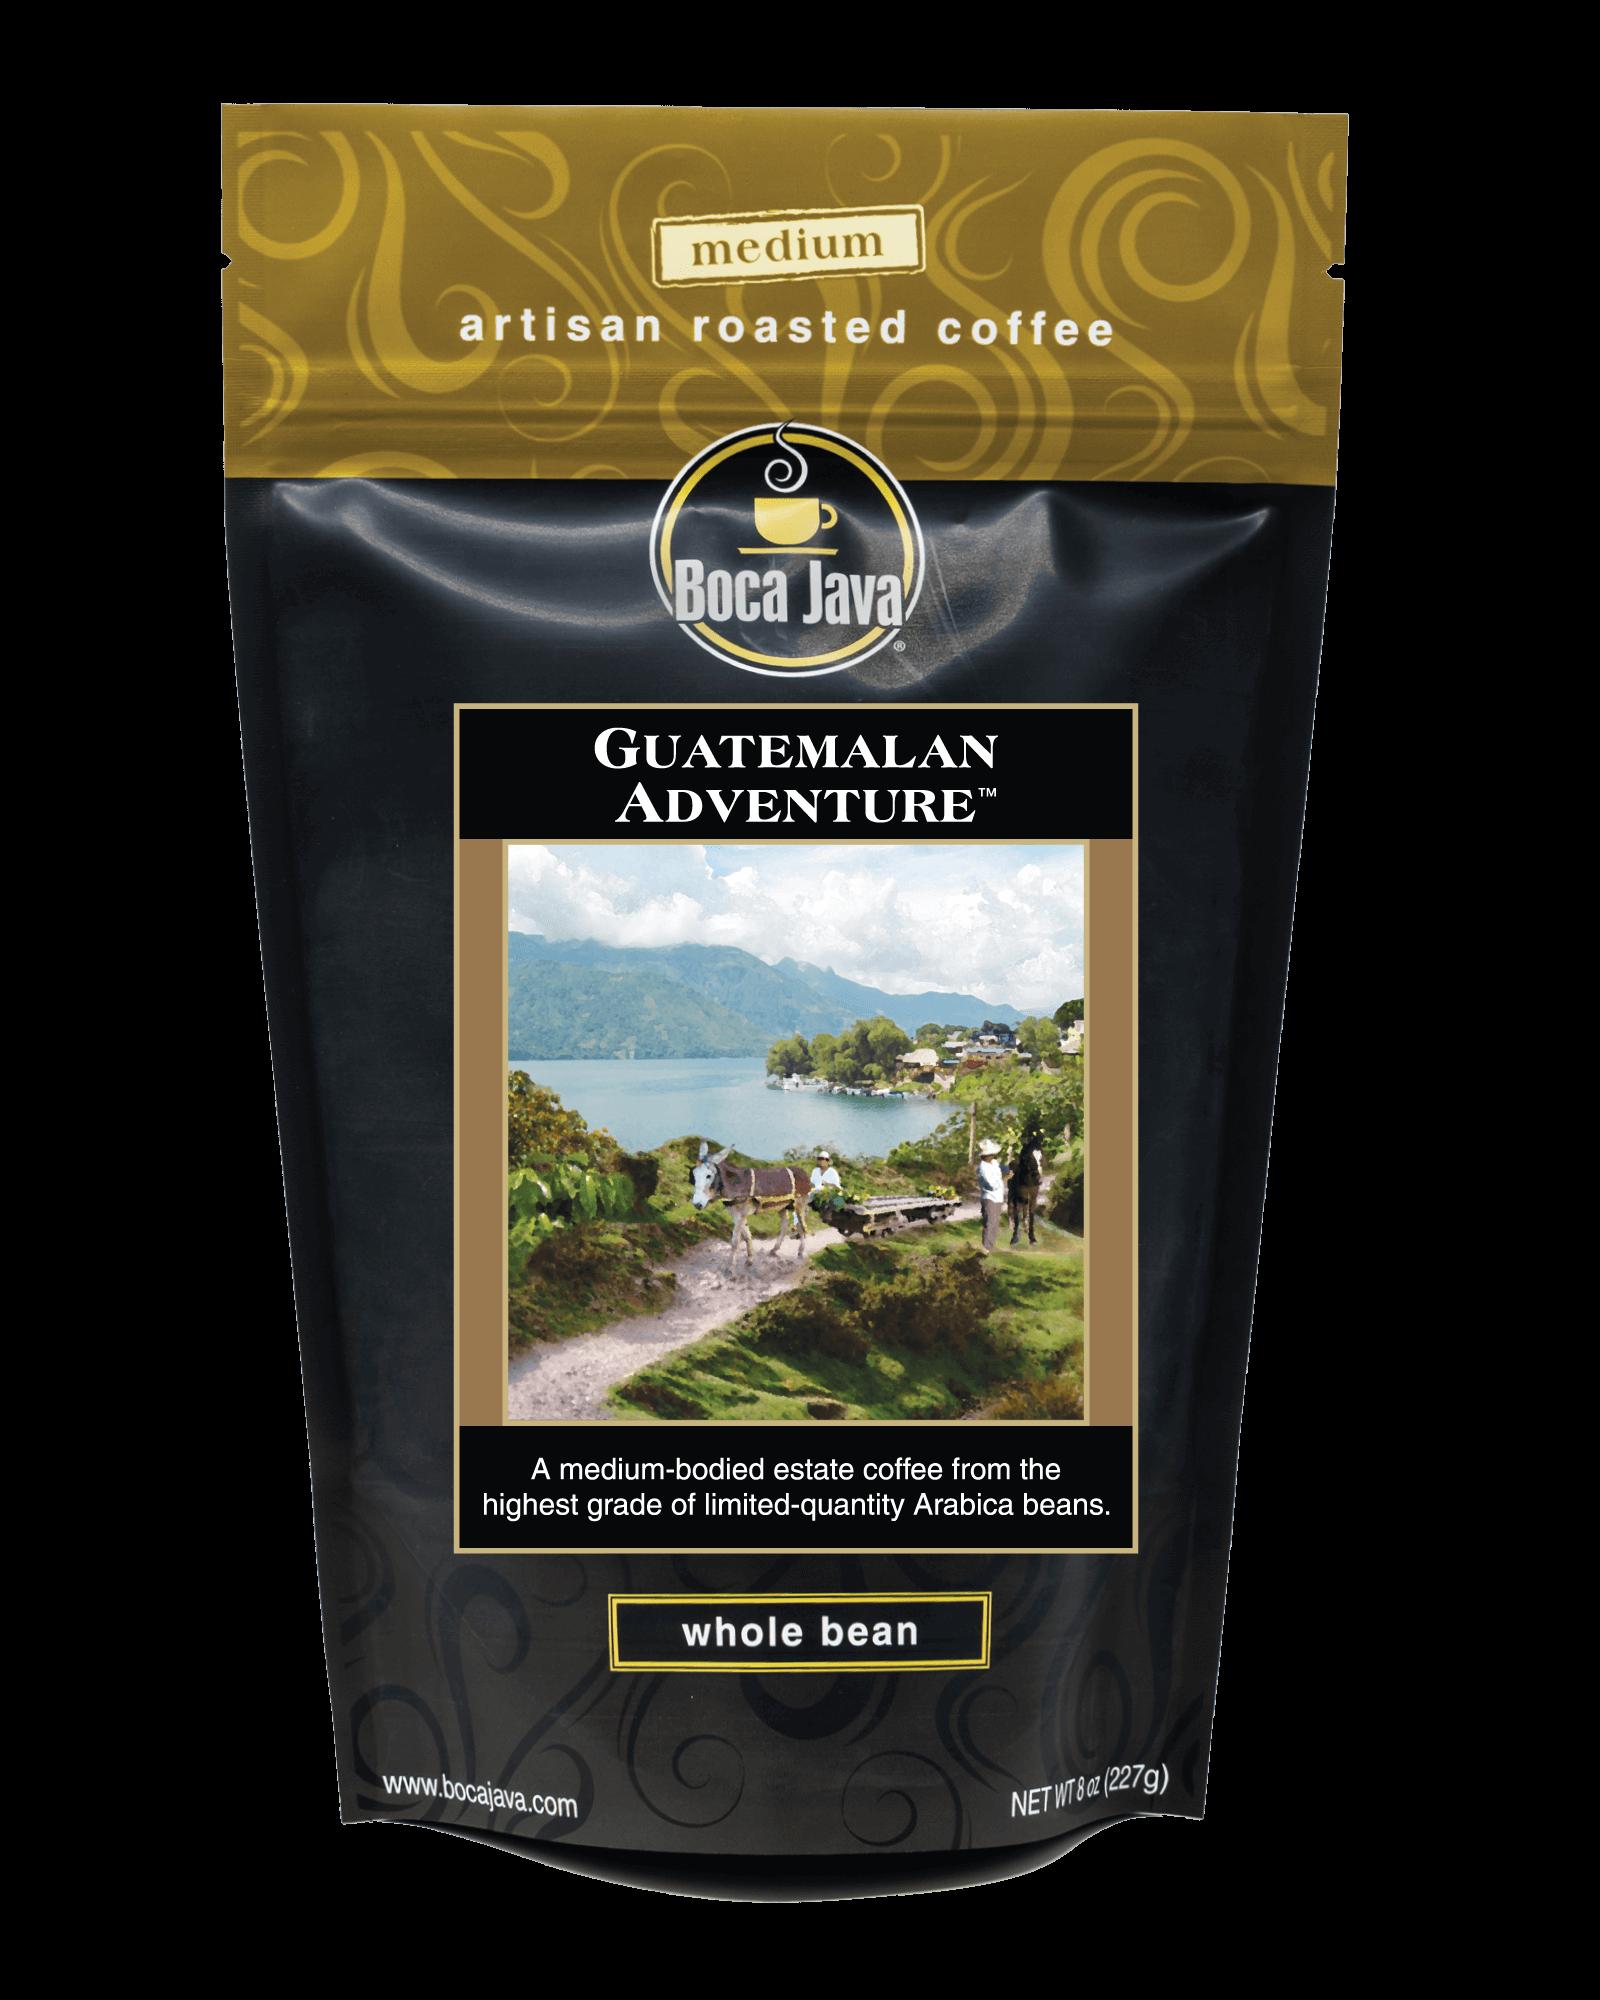 Guatemalan Adventure